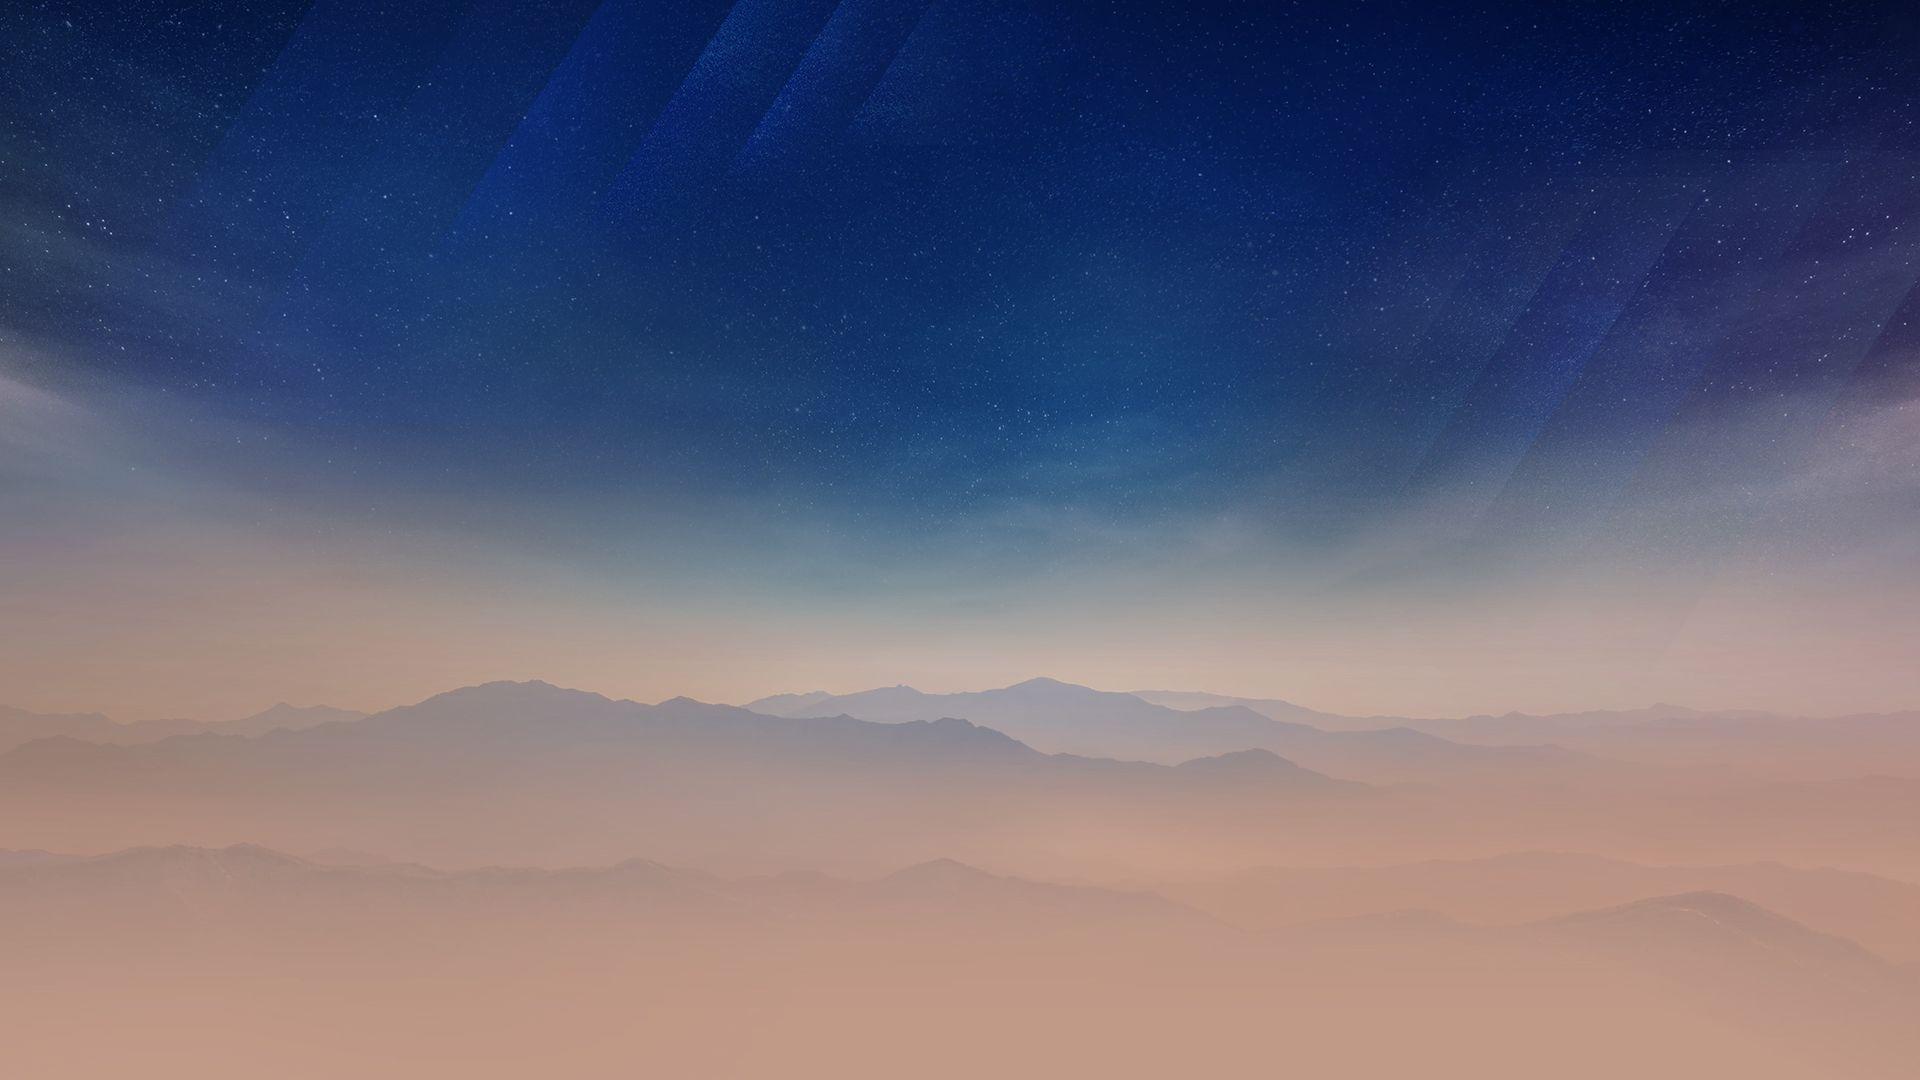 Samsung Dex Wallpapers Top Free Samsung Dex Backgrounds Wallpaperaccess